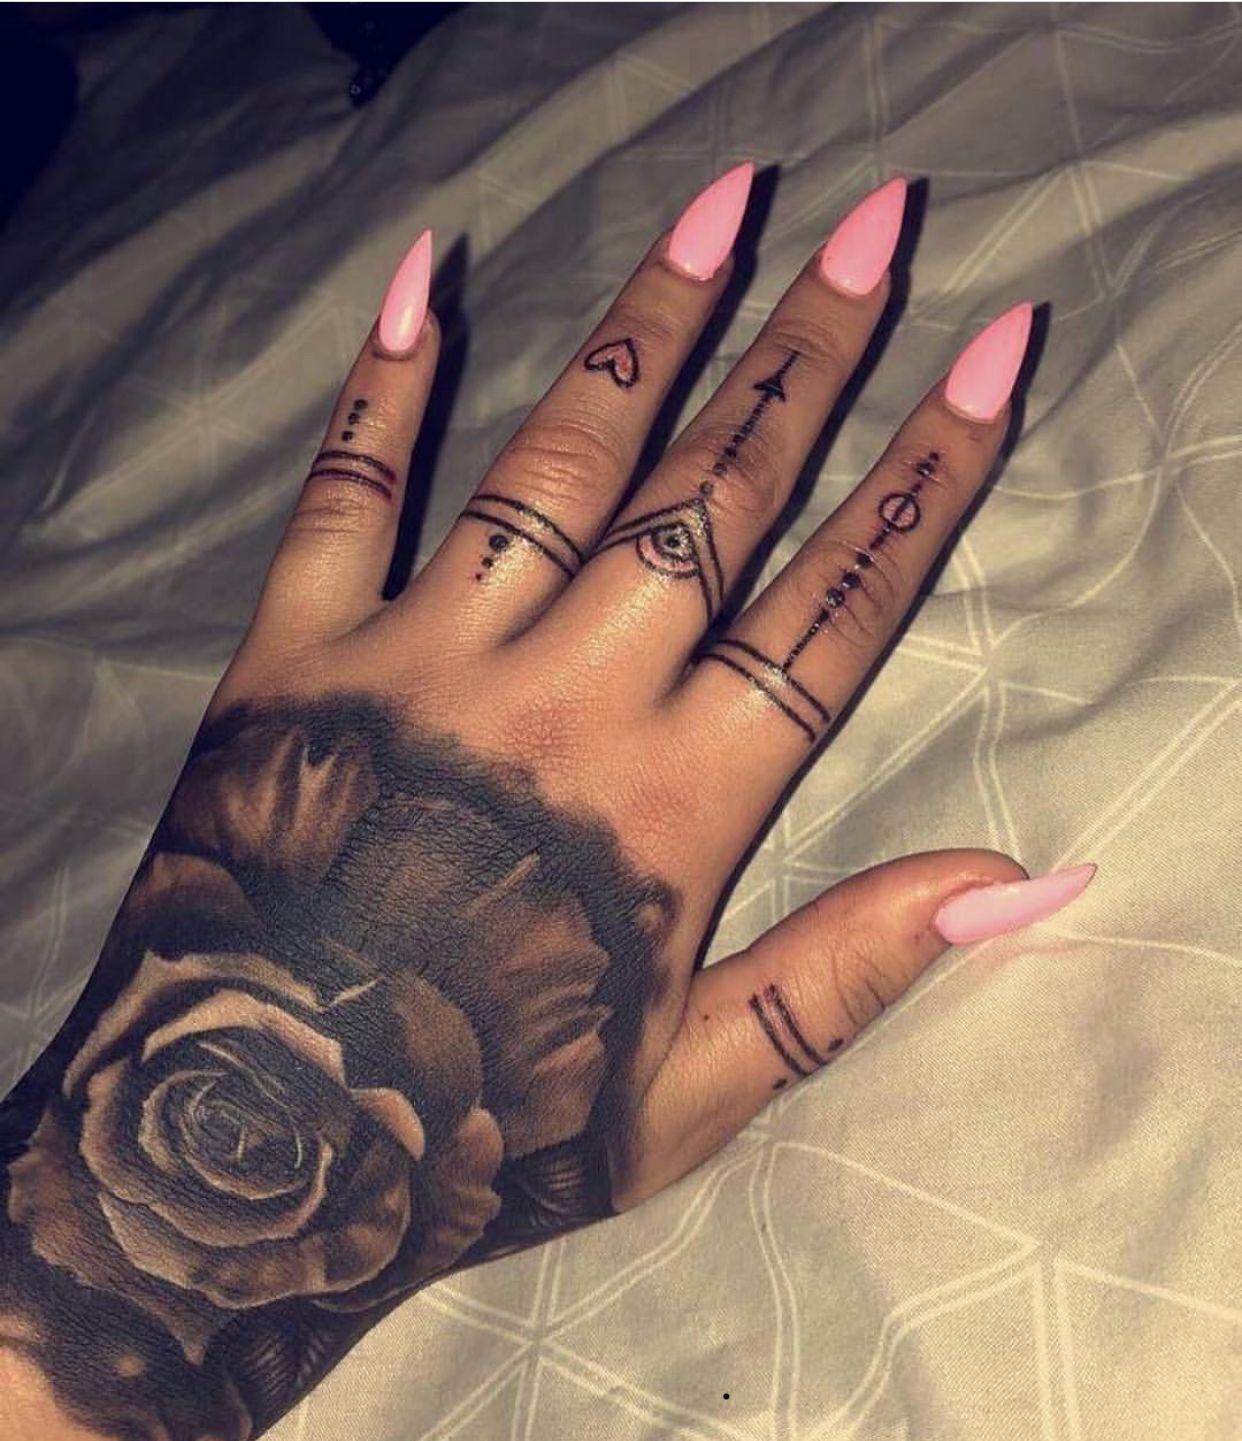 Follow Sunniesun Susie Hand Tattoos Tribal Hand Tattoos Hand Tattoos For Women